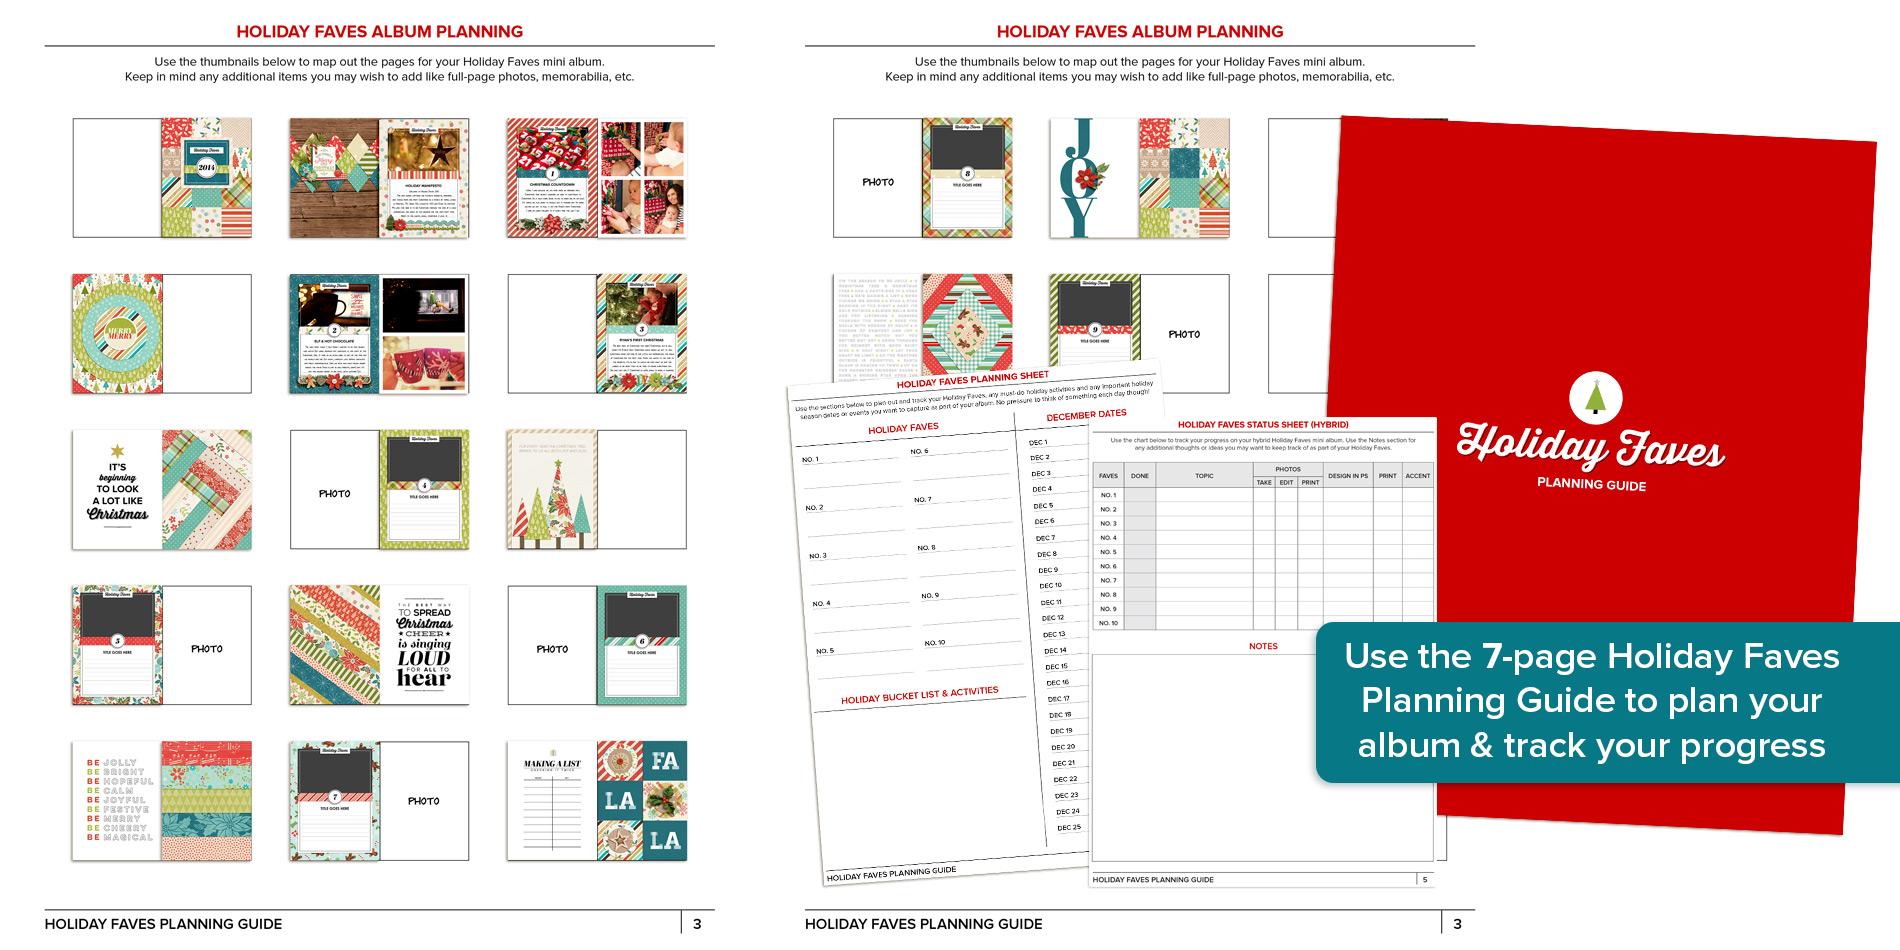 nettiodesigns_HF2015_planning-new3